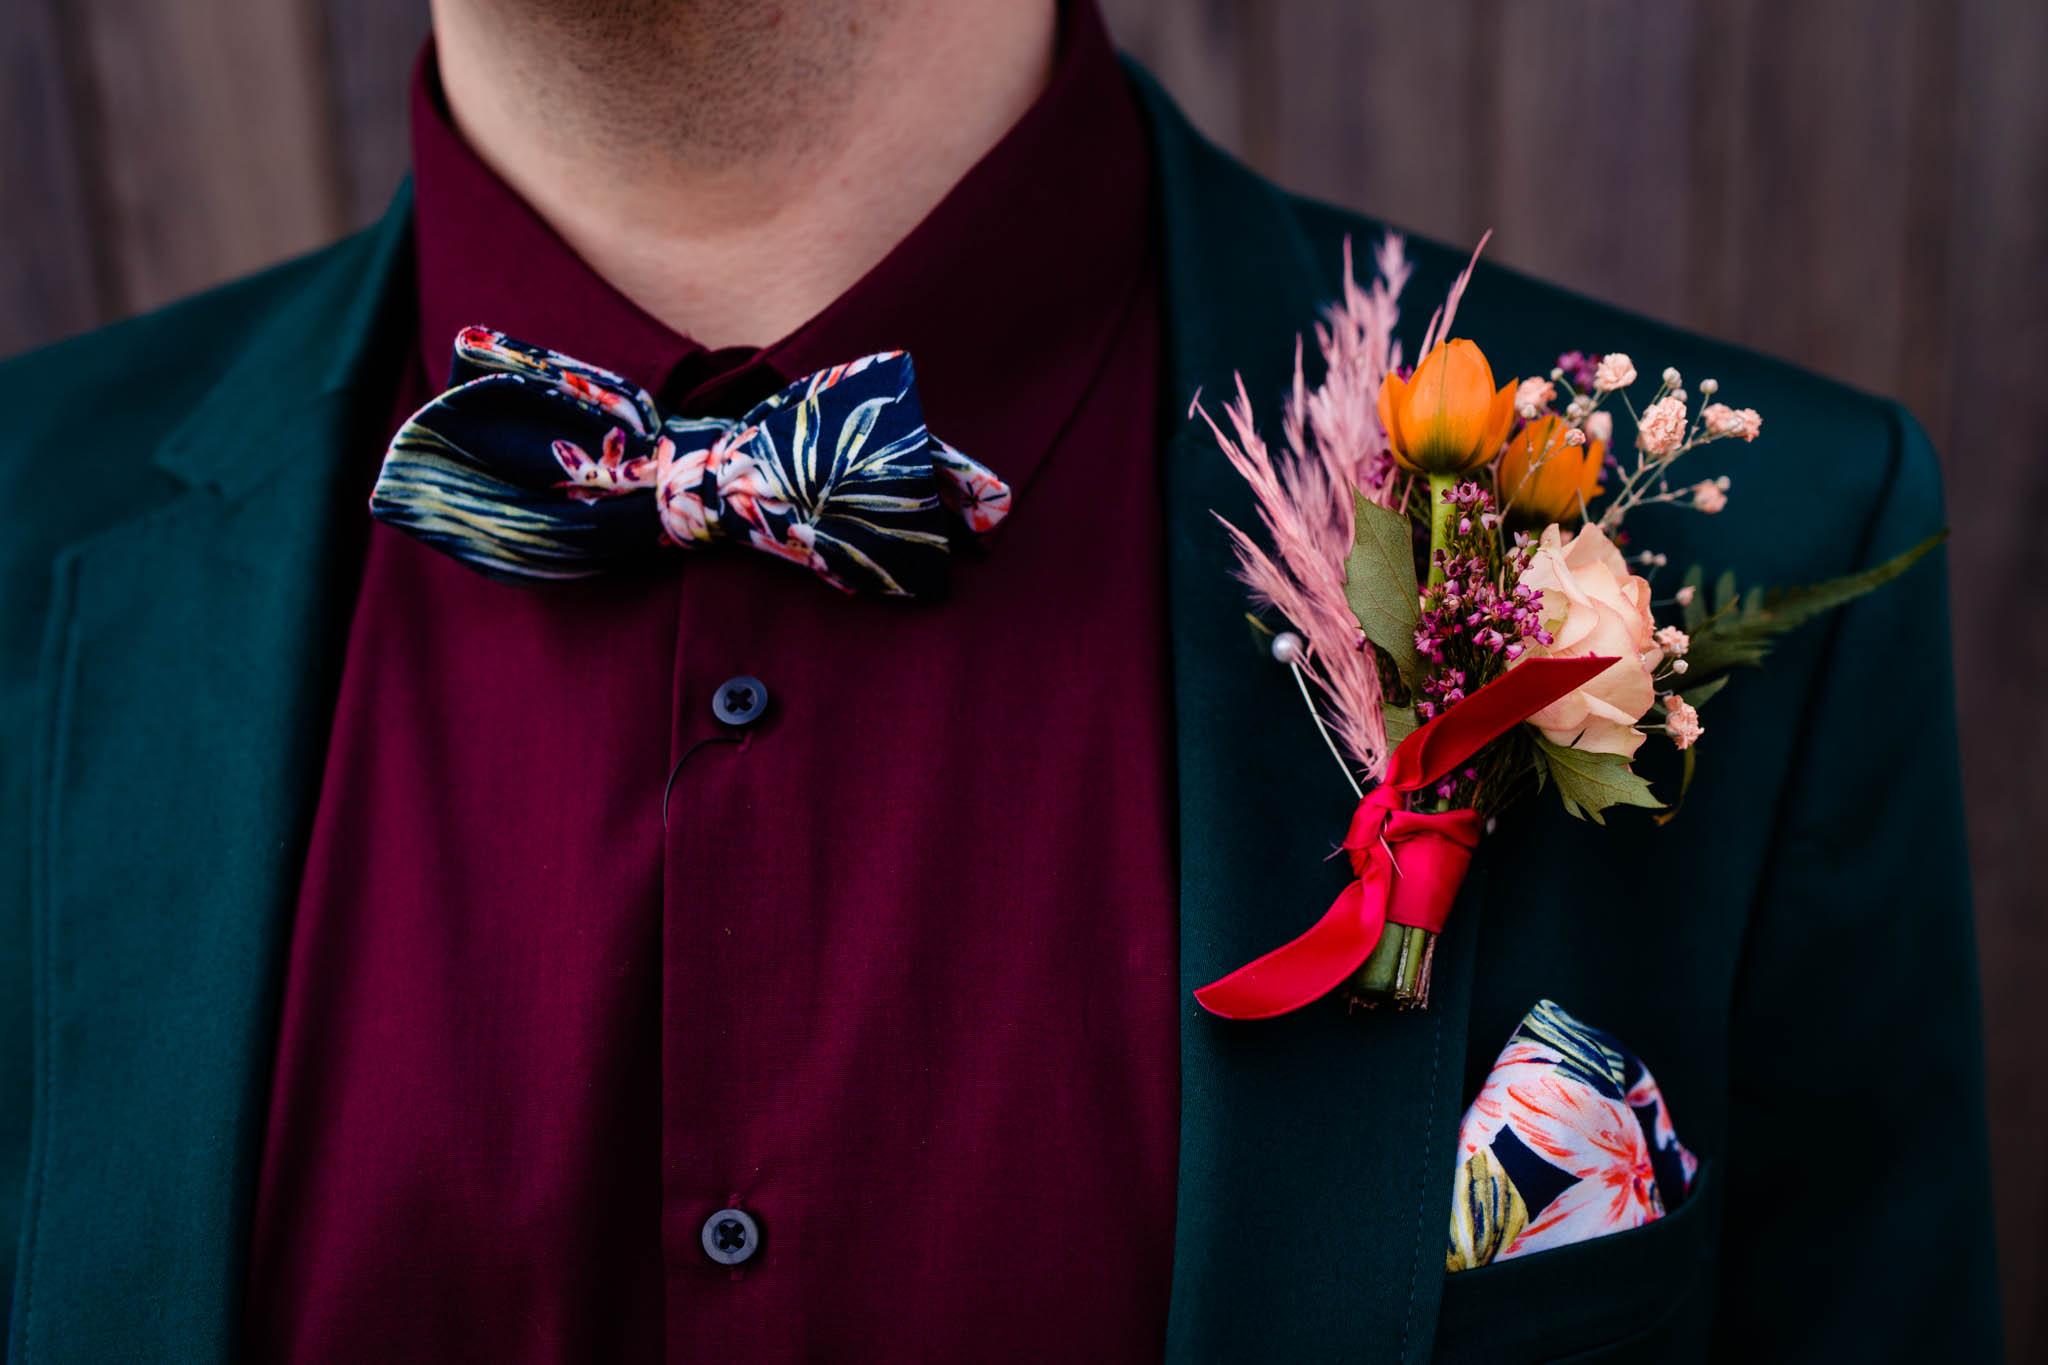 unique grooms buttonhole - unique groomswear - modern tropical wedding - modern wedding - modern bride - east midlands wedding planner